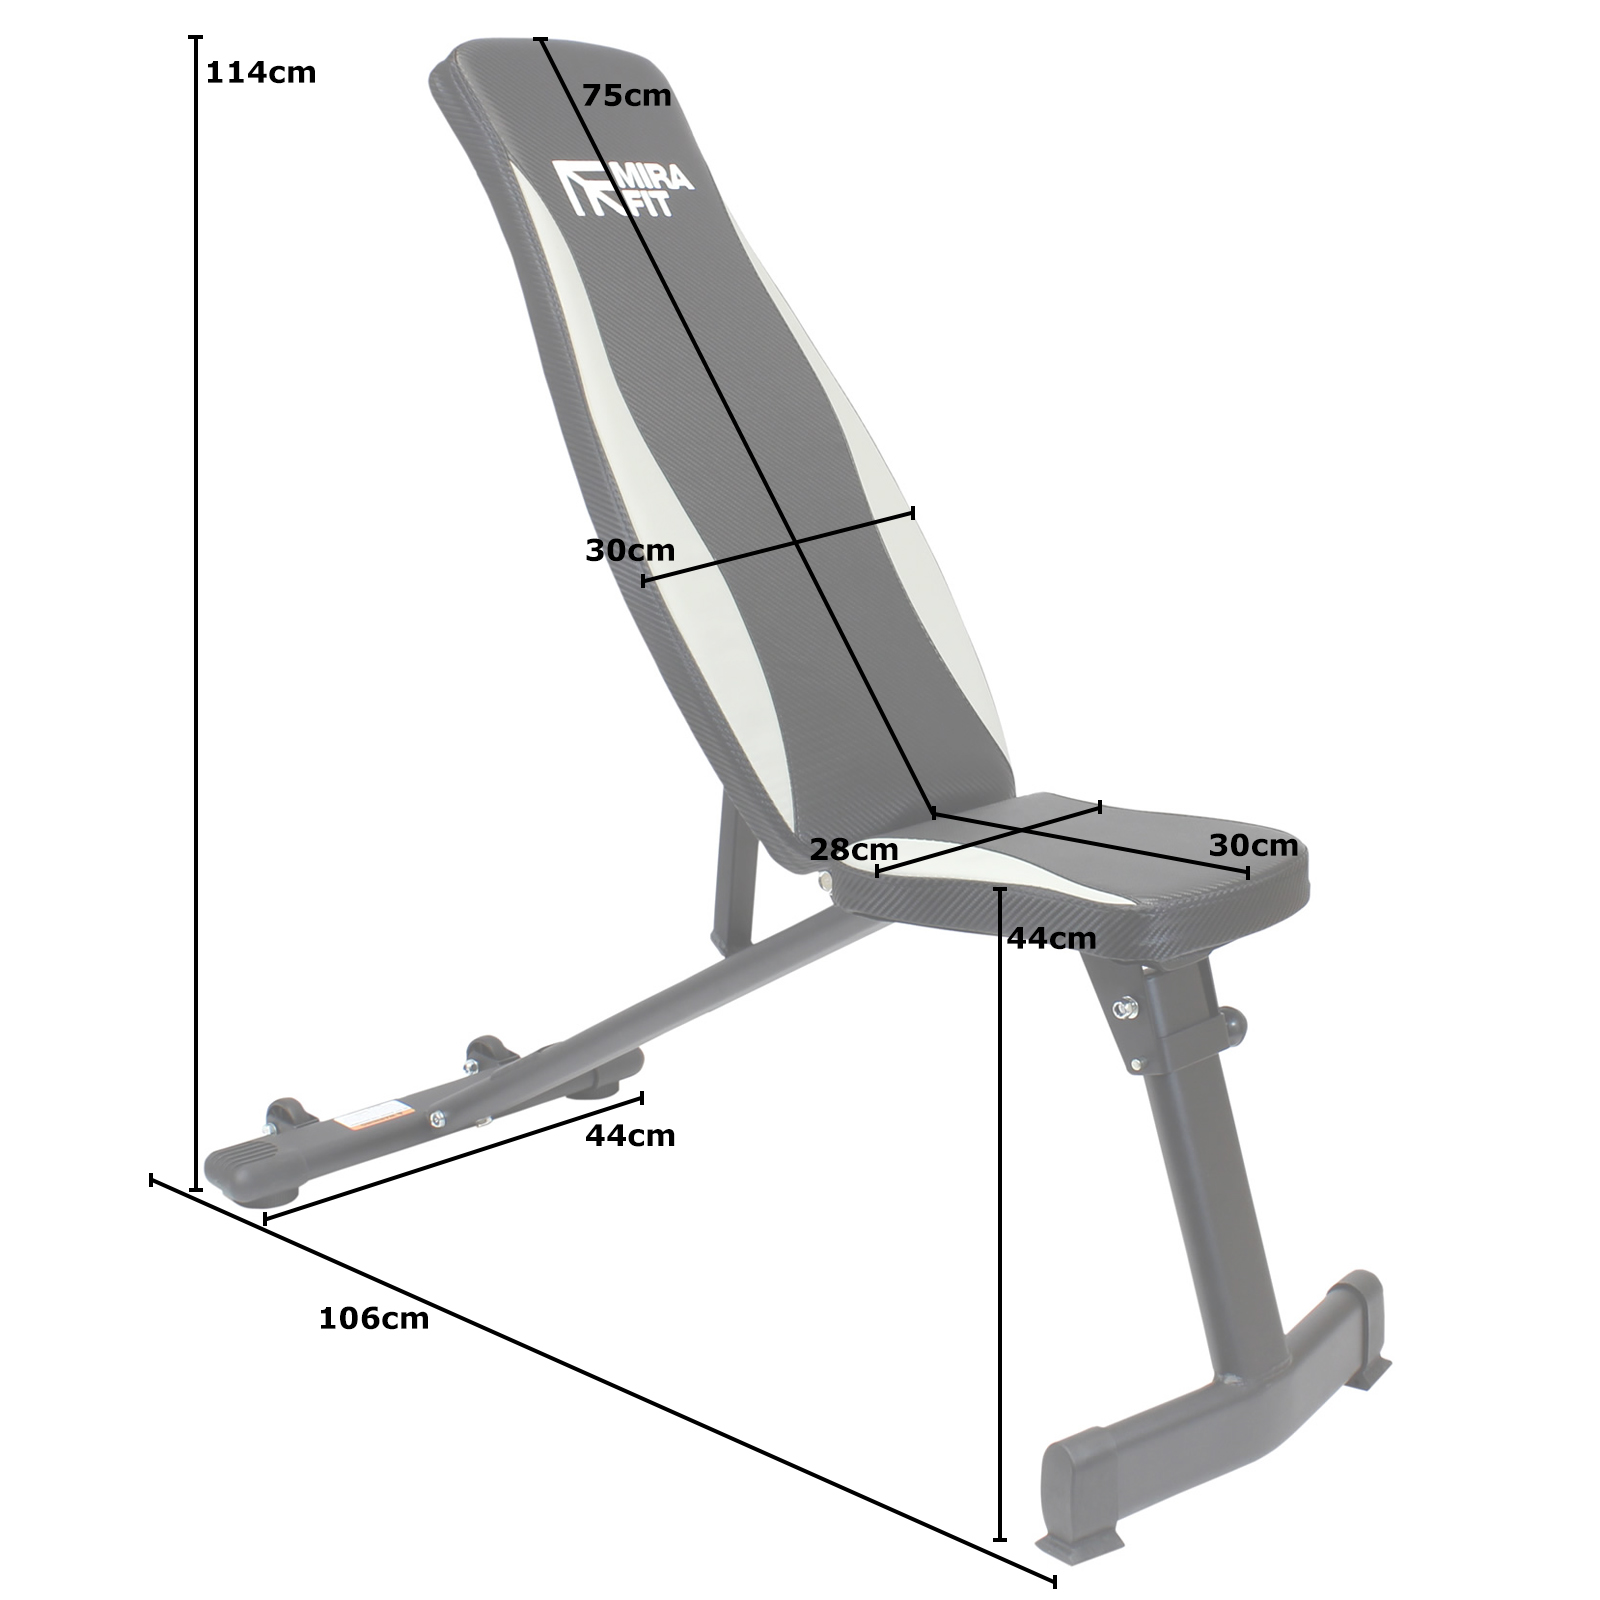 weight htm pre barbell vigorfitness press p bar gym am sale bench end workout